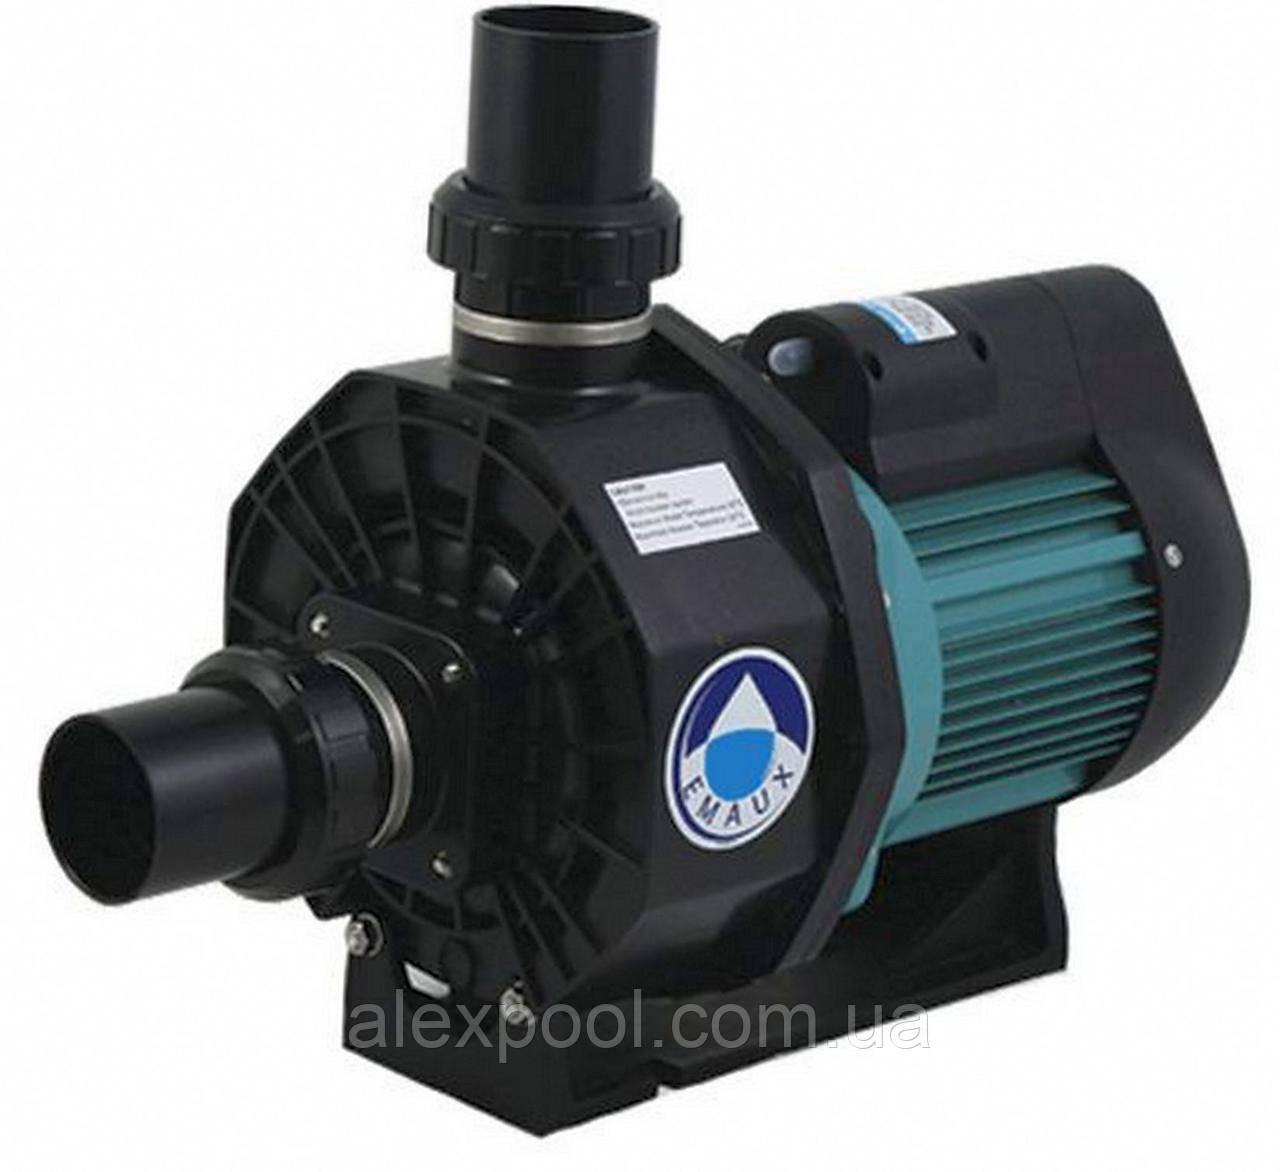 Насос Emaux SR30 ( SR 30, 31 м. куб/год, 2.18 кВт, 3,0 HP, 220В)